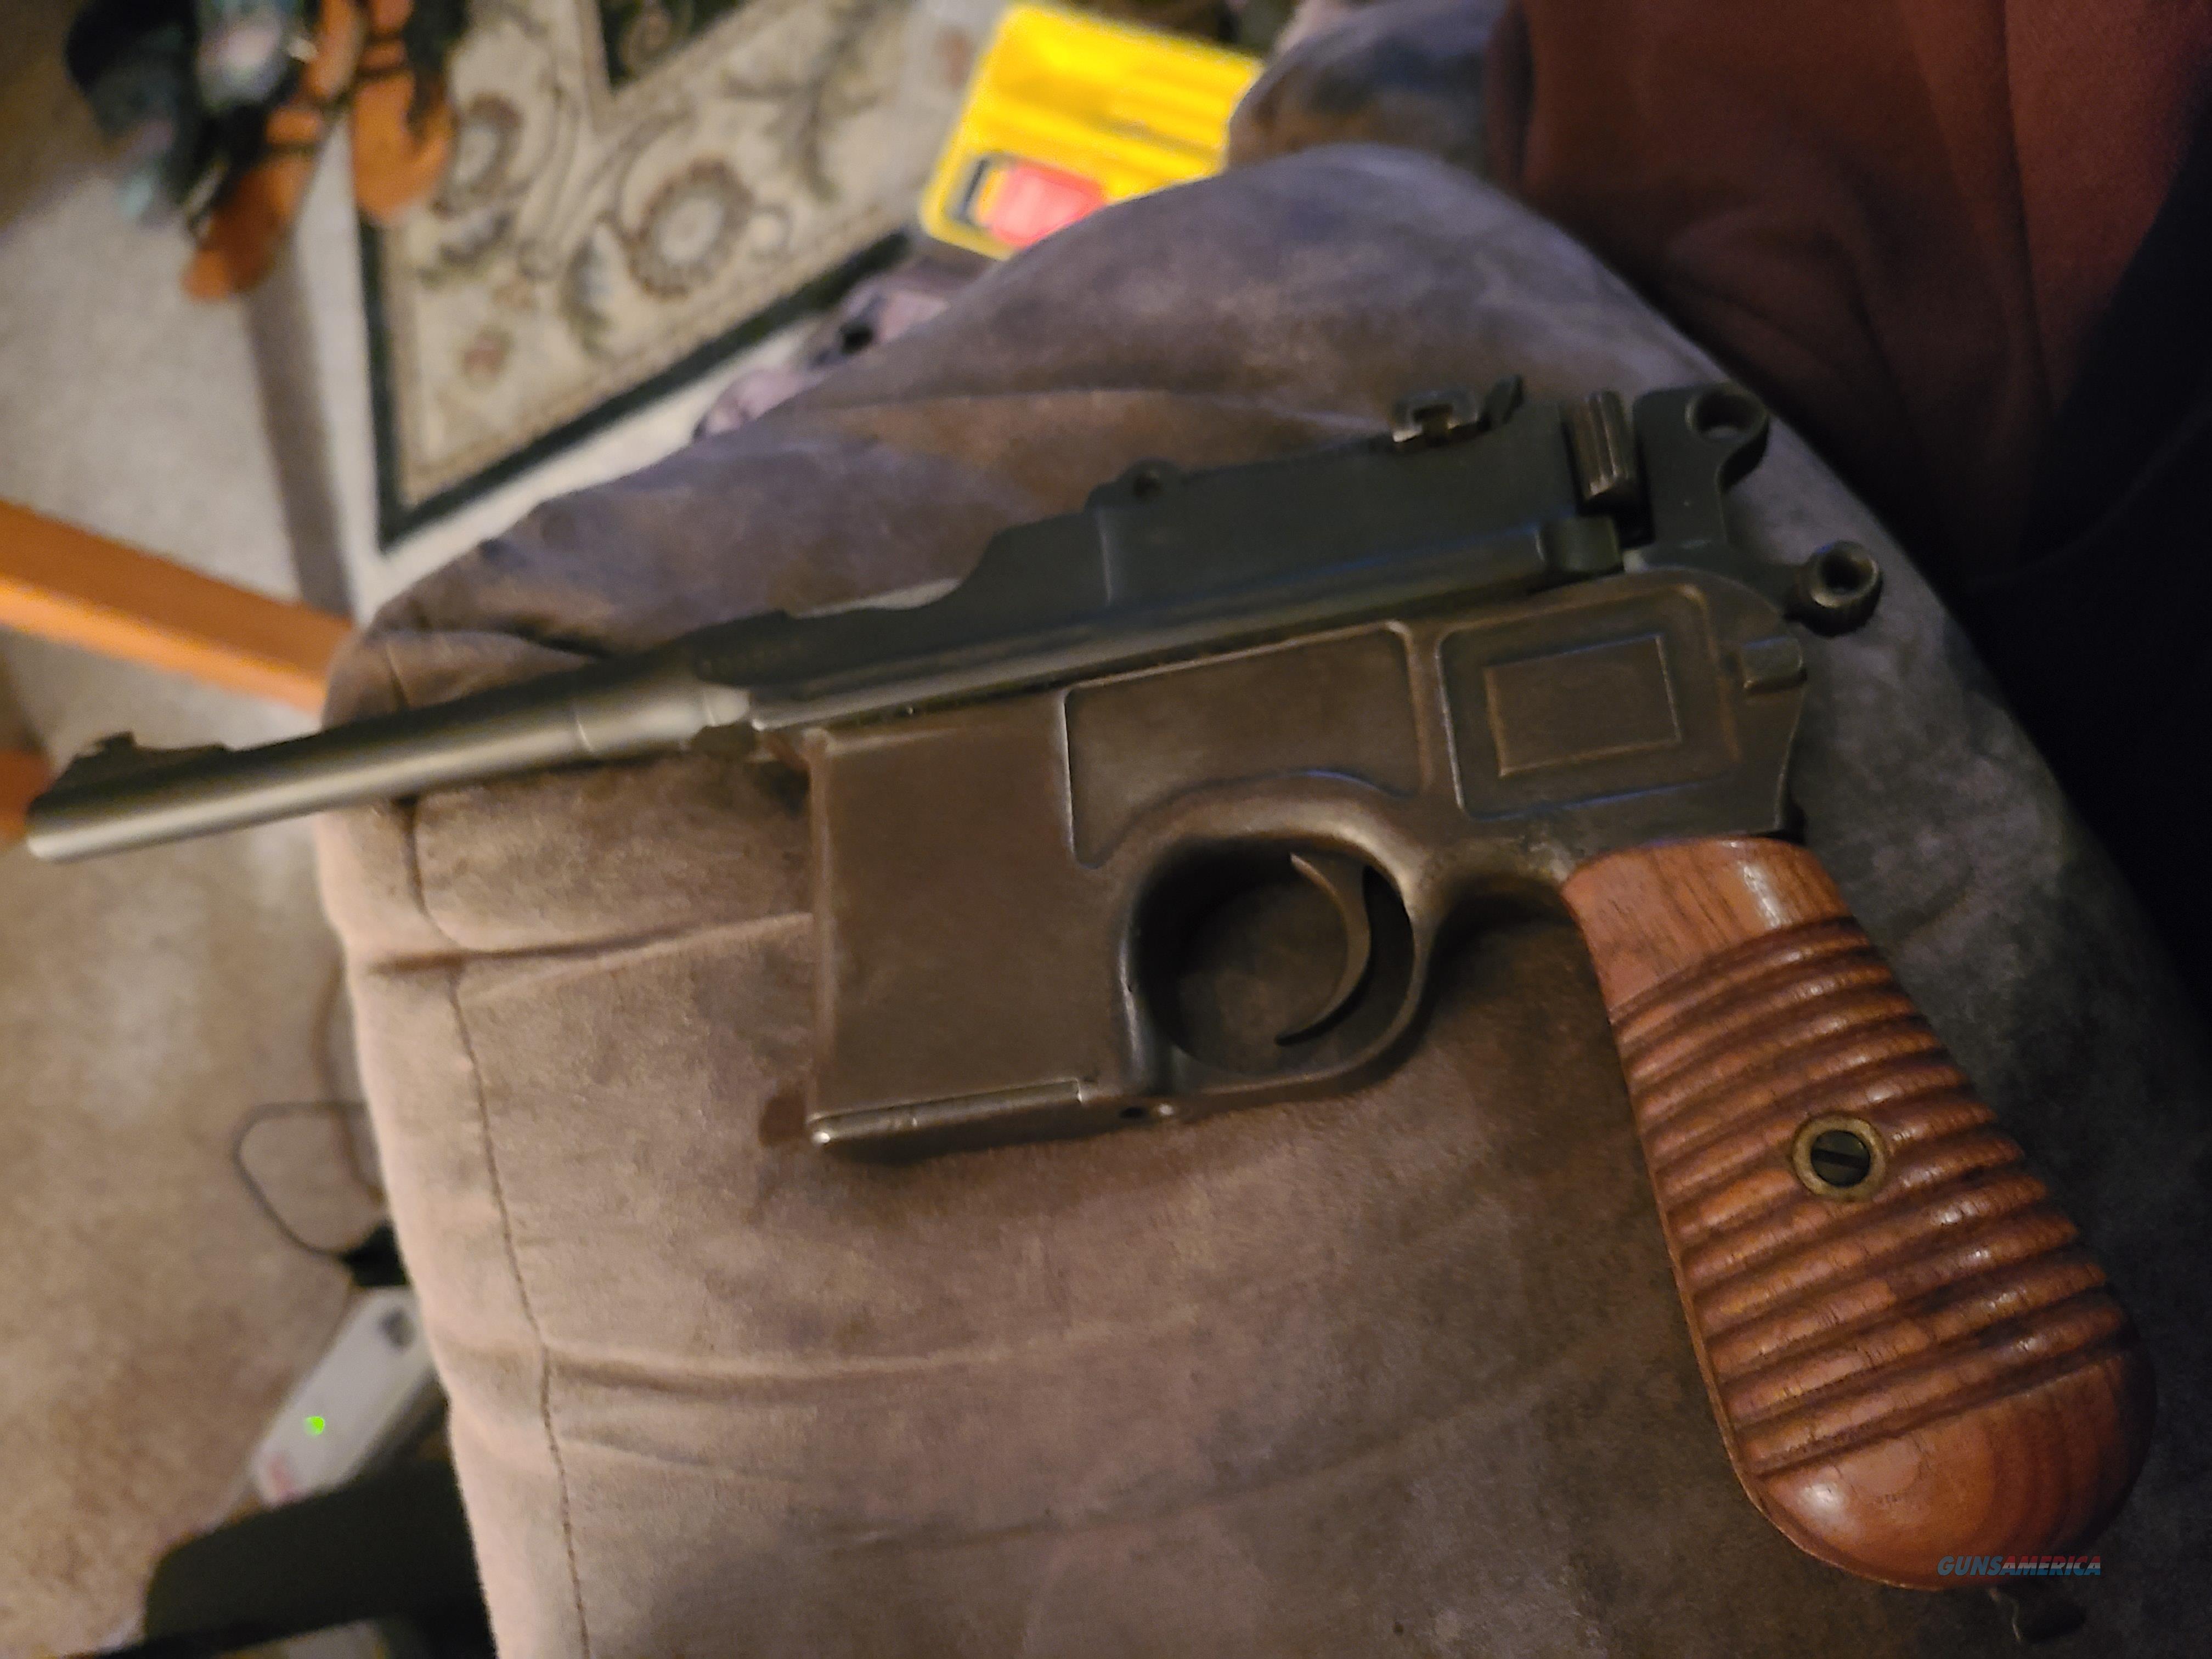 Ww2 mauser  Guns > Pistols > Mauser Pistols